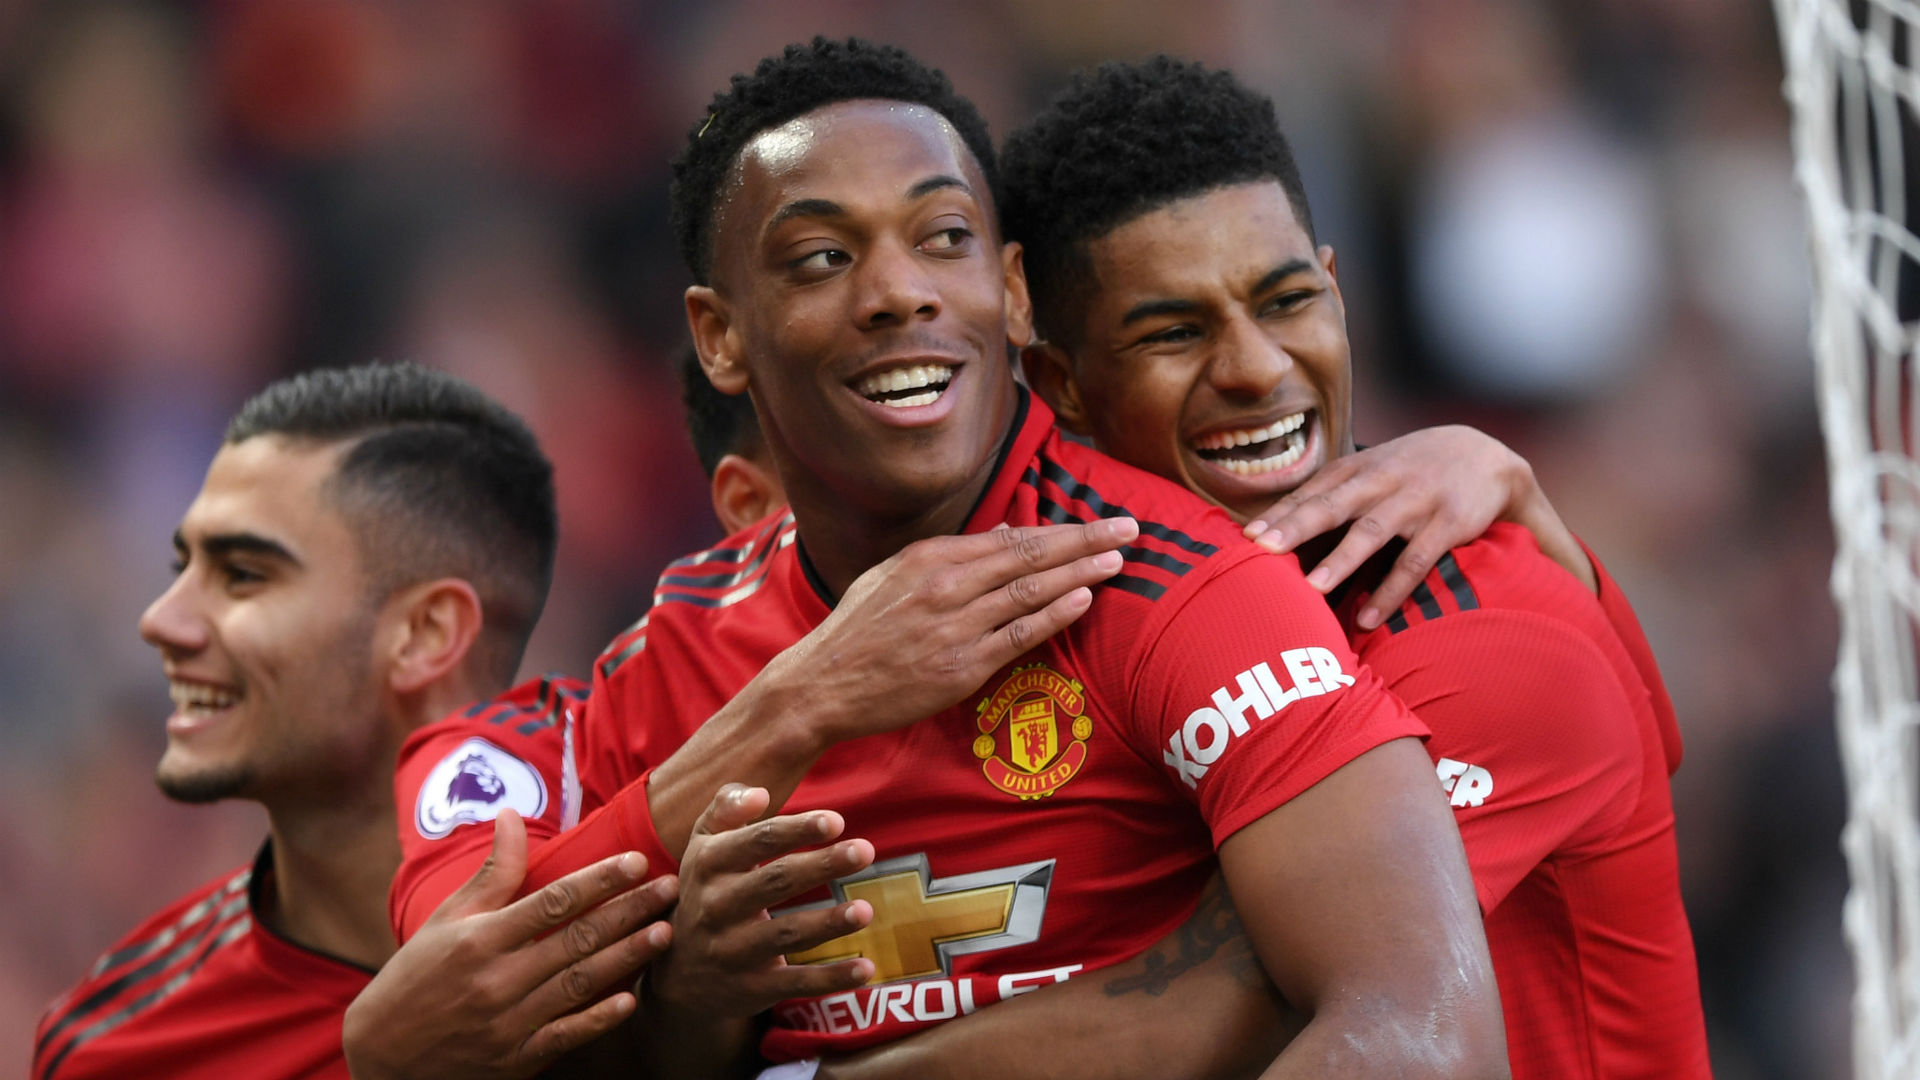 Menanti Daya Ledak Lini Depan Manchester United Berita